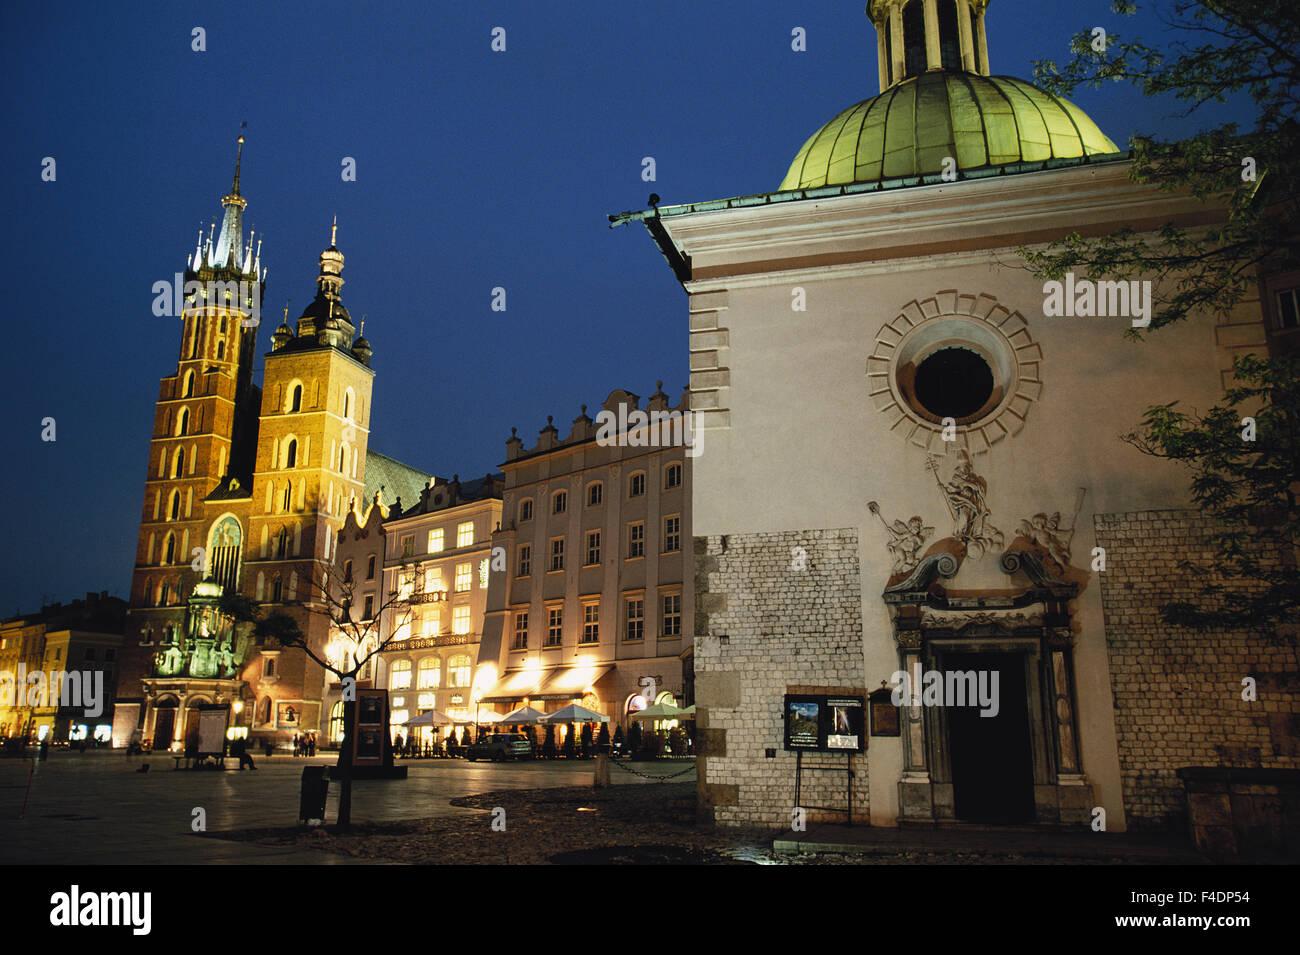 Poland, Krakow. Rynek Glowny Square, and St Mary's Basilica. (Large format sizes available) - Stock Image